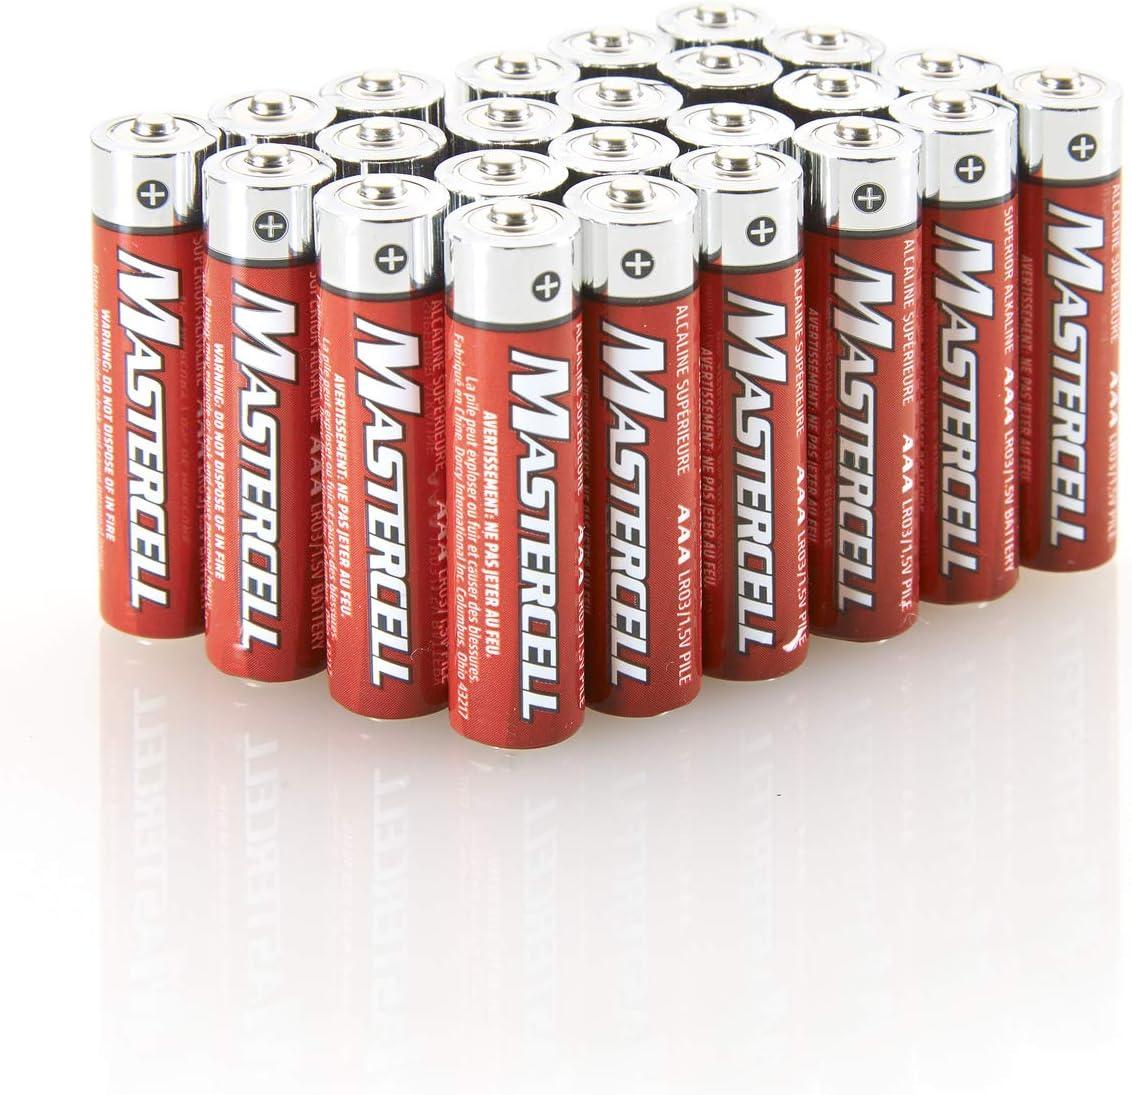 Dorcy Over item handling ☆ Elegant Mastercell AAA Alkaline 41-1636 24-Pack Batteries